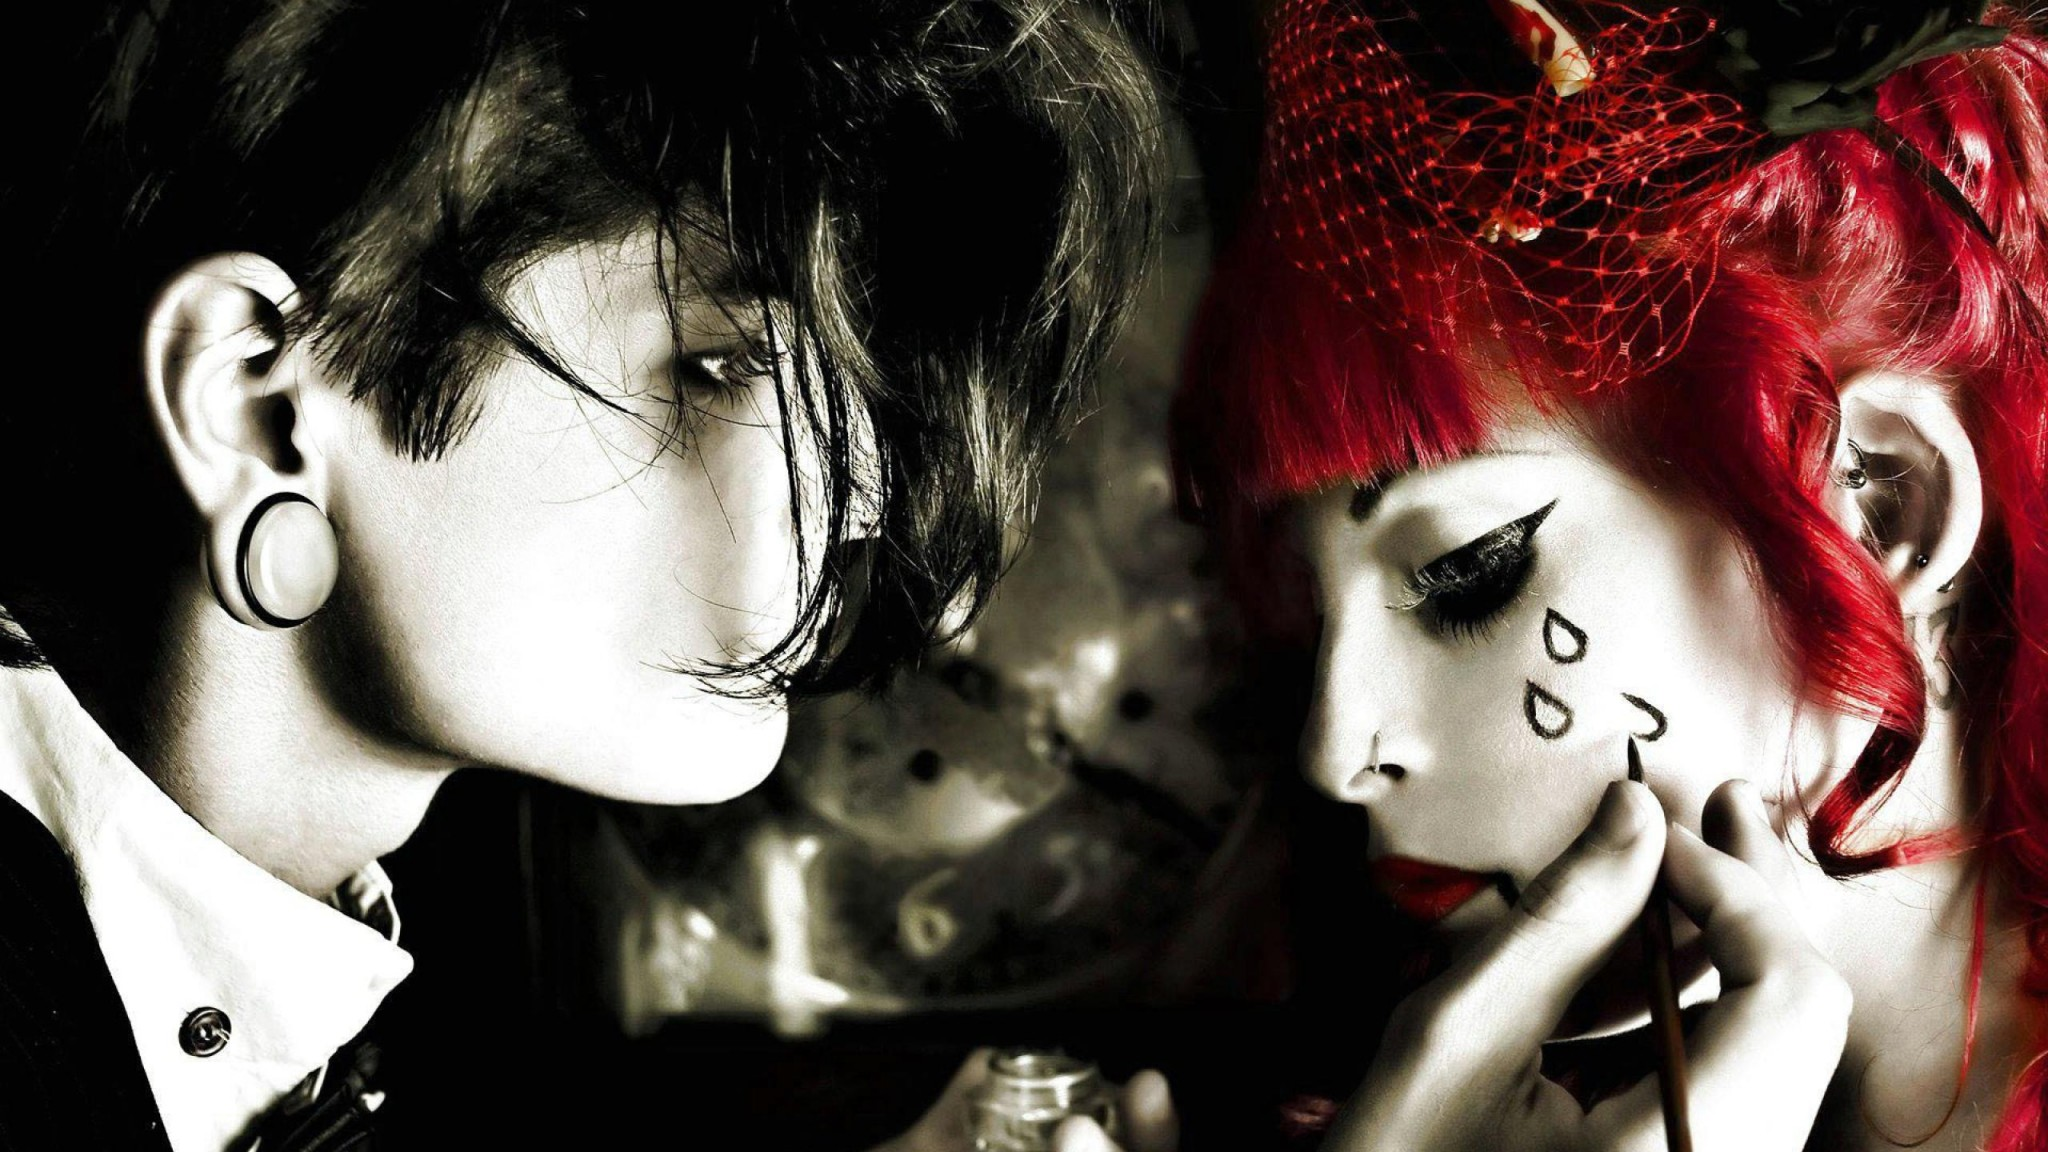 Girls Emo Style    HD HD Wallpaper